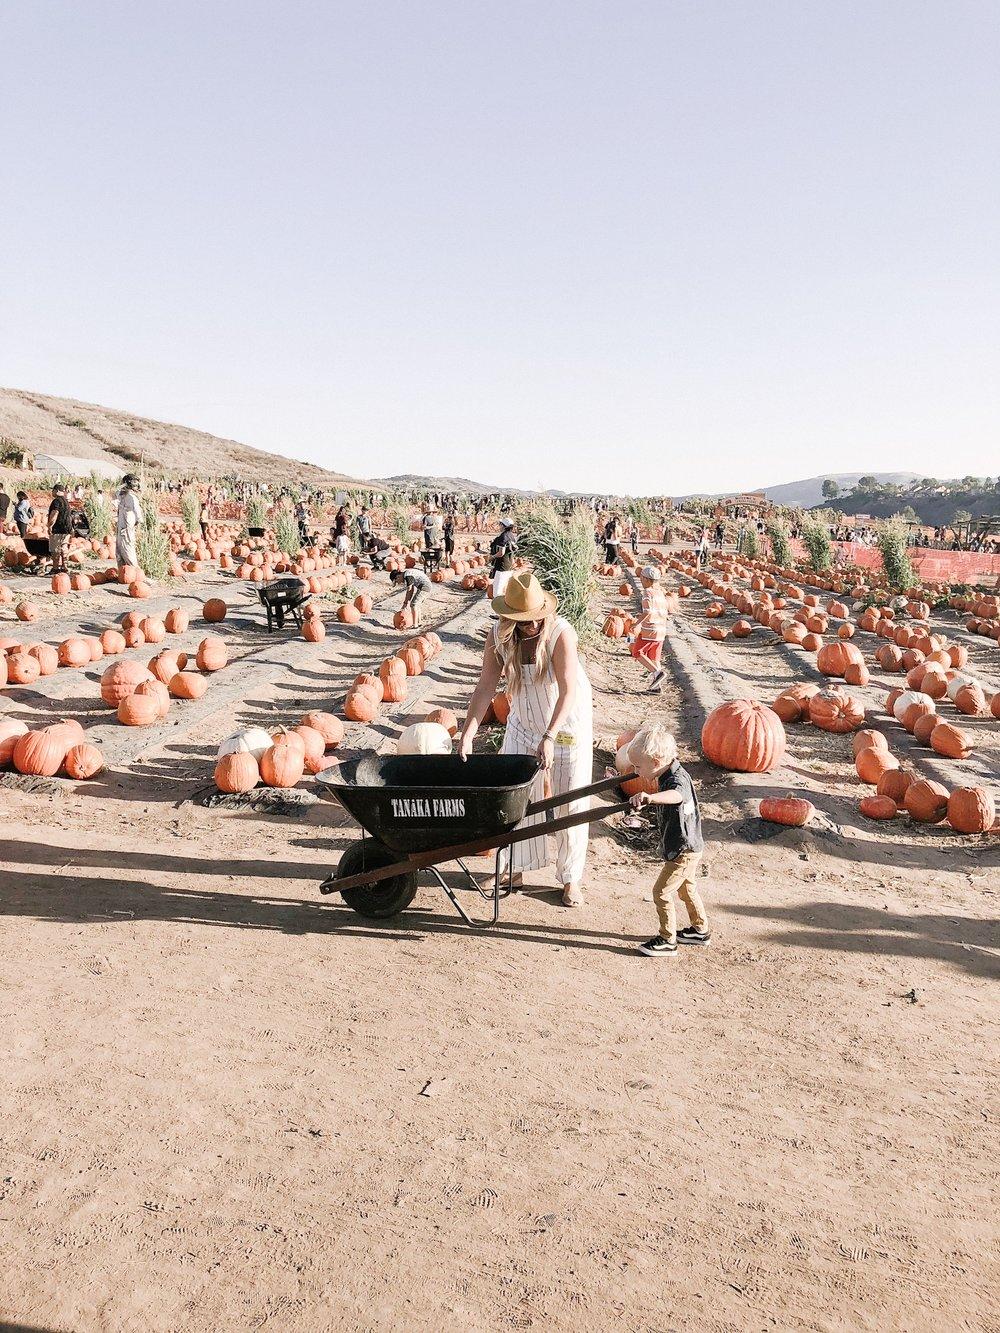 tanaka farms pumpkin patch wheelbarrow.JPG